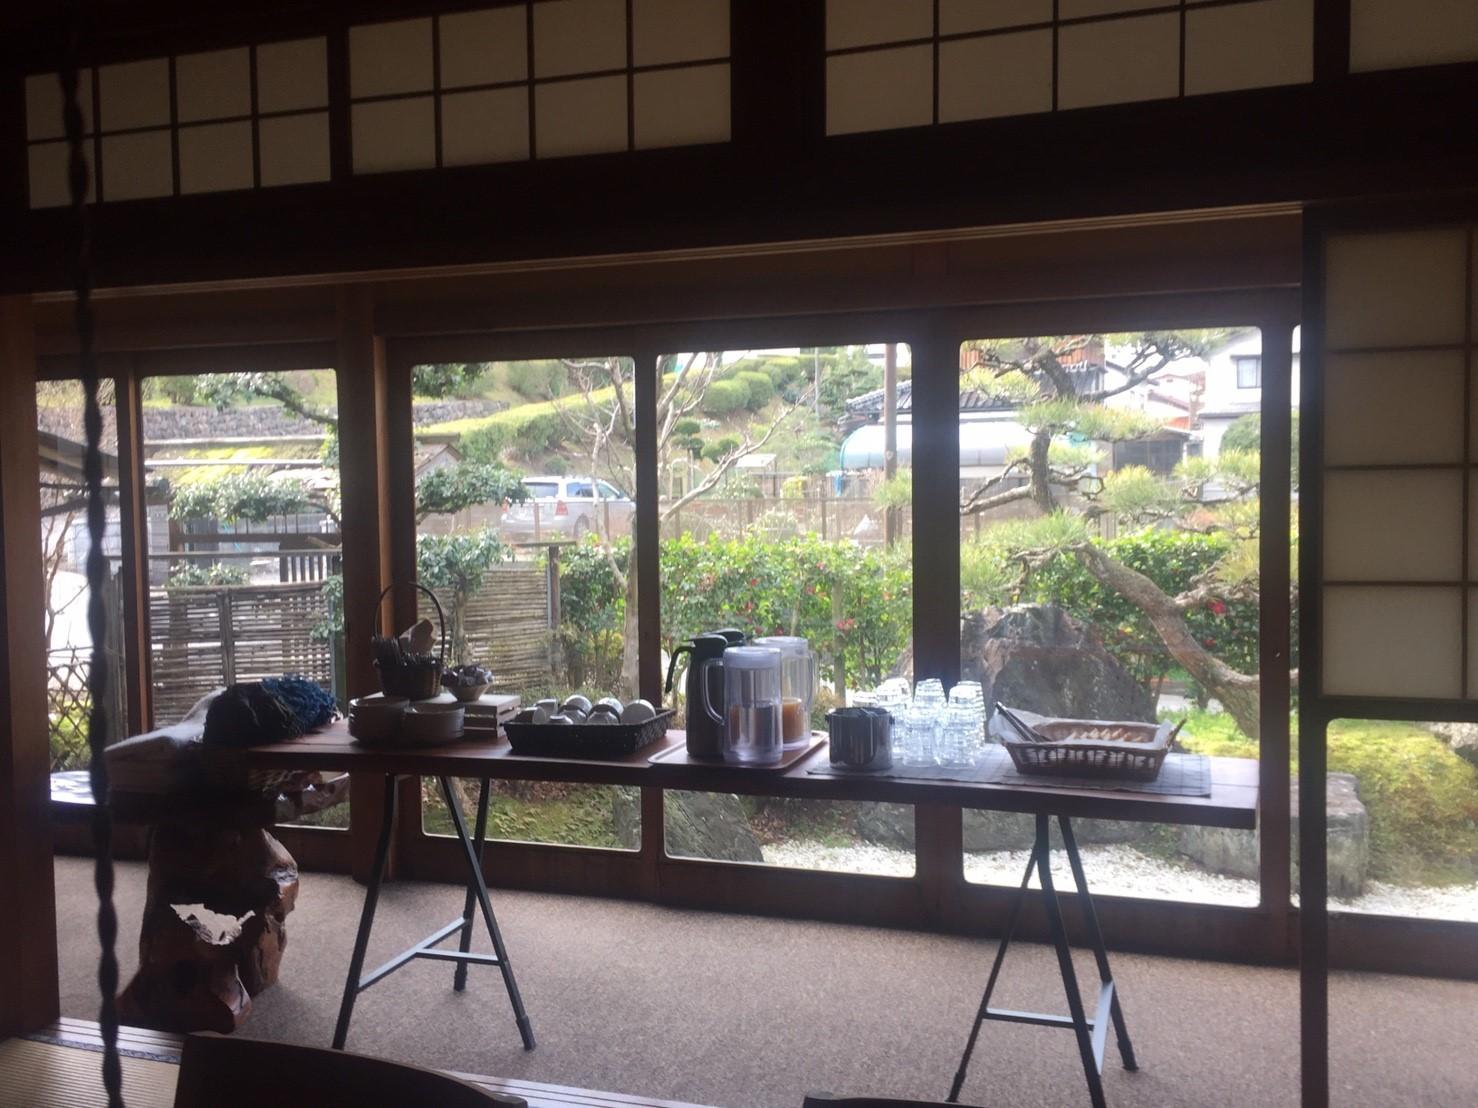 kitchin & cafe 葵屋_e0115904_04535671.jpg